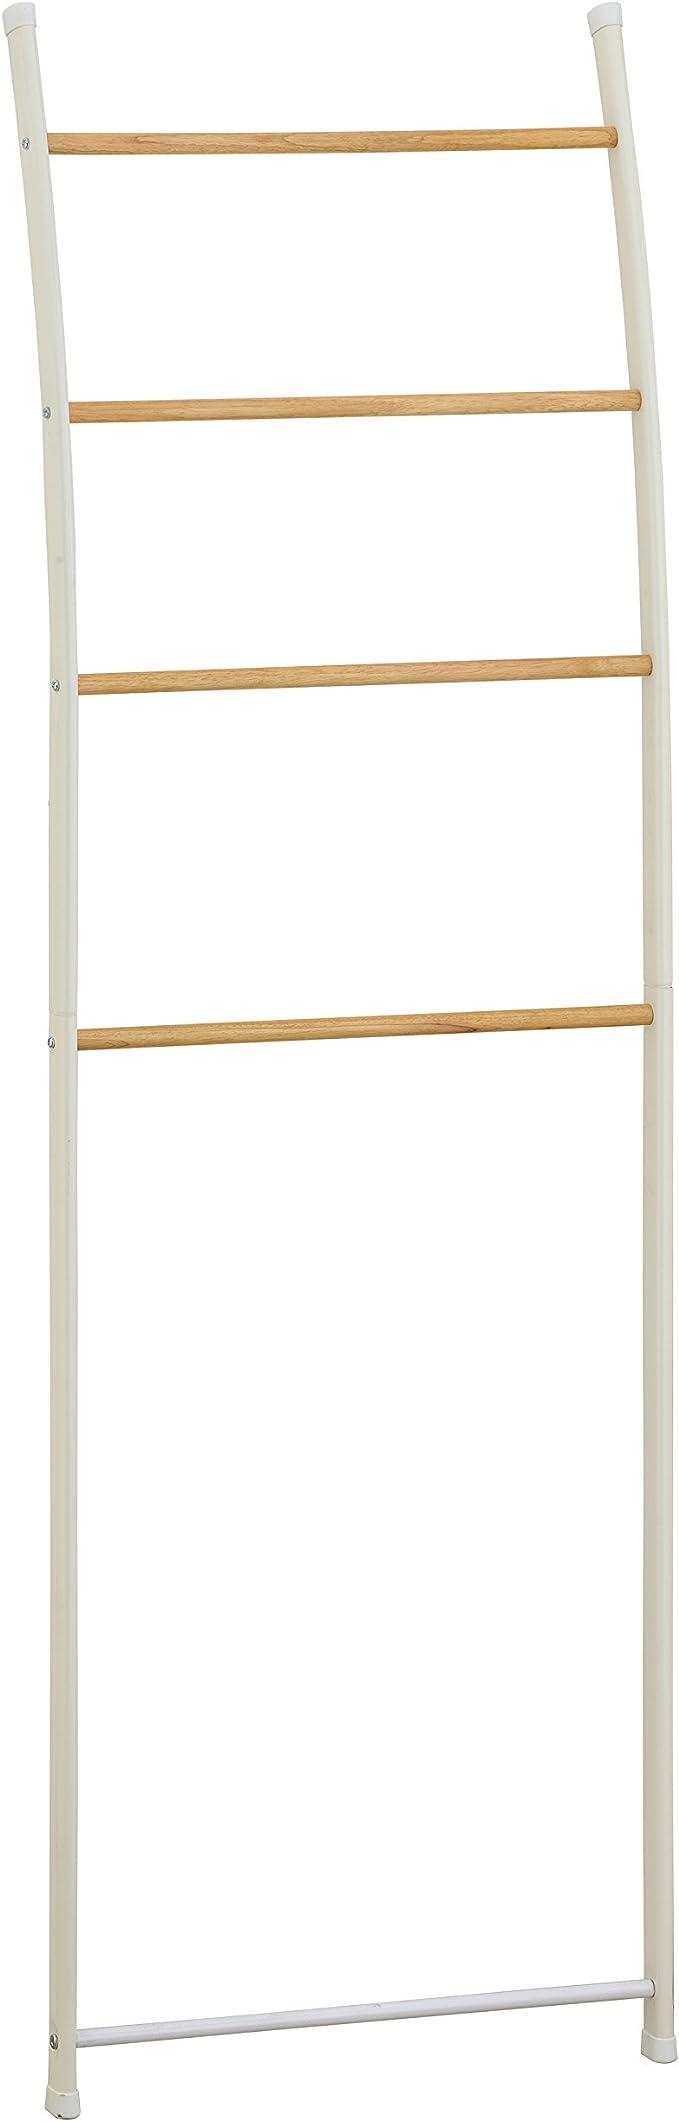 Tomasucci Rino Escalera Decorativa/toallero, Metal, Blanco, 150 x 44 x 10 cm: Amazon.es: Hogar